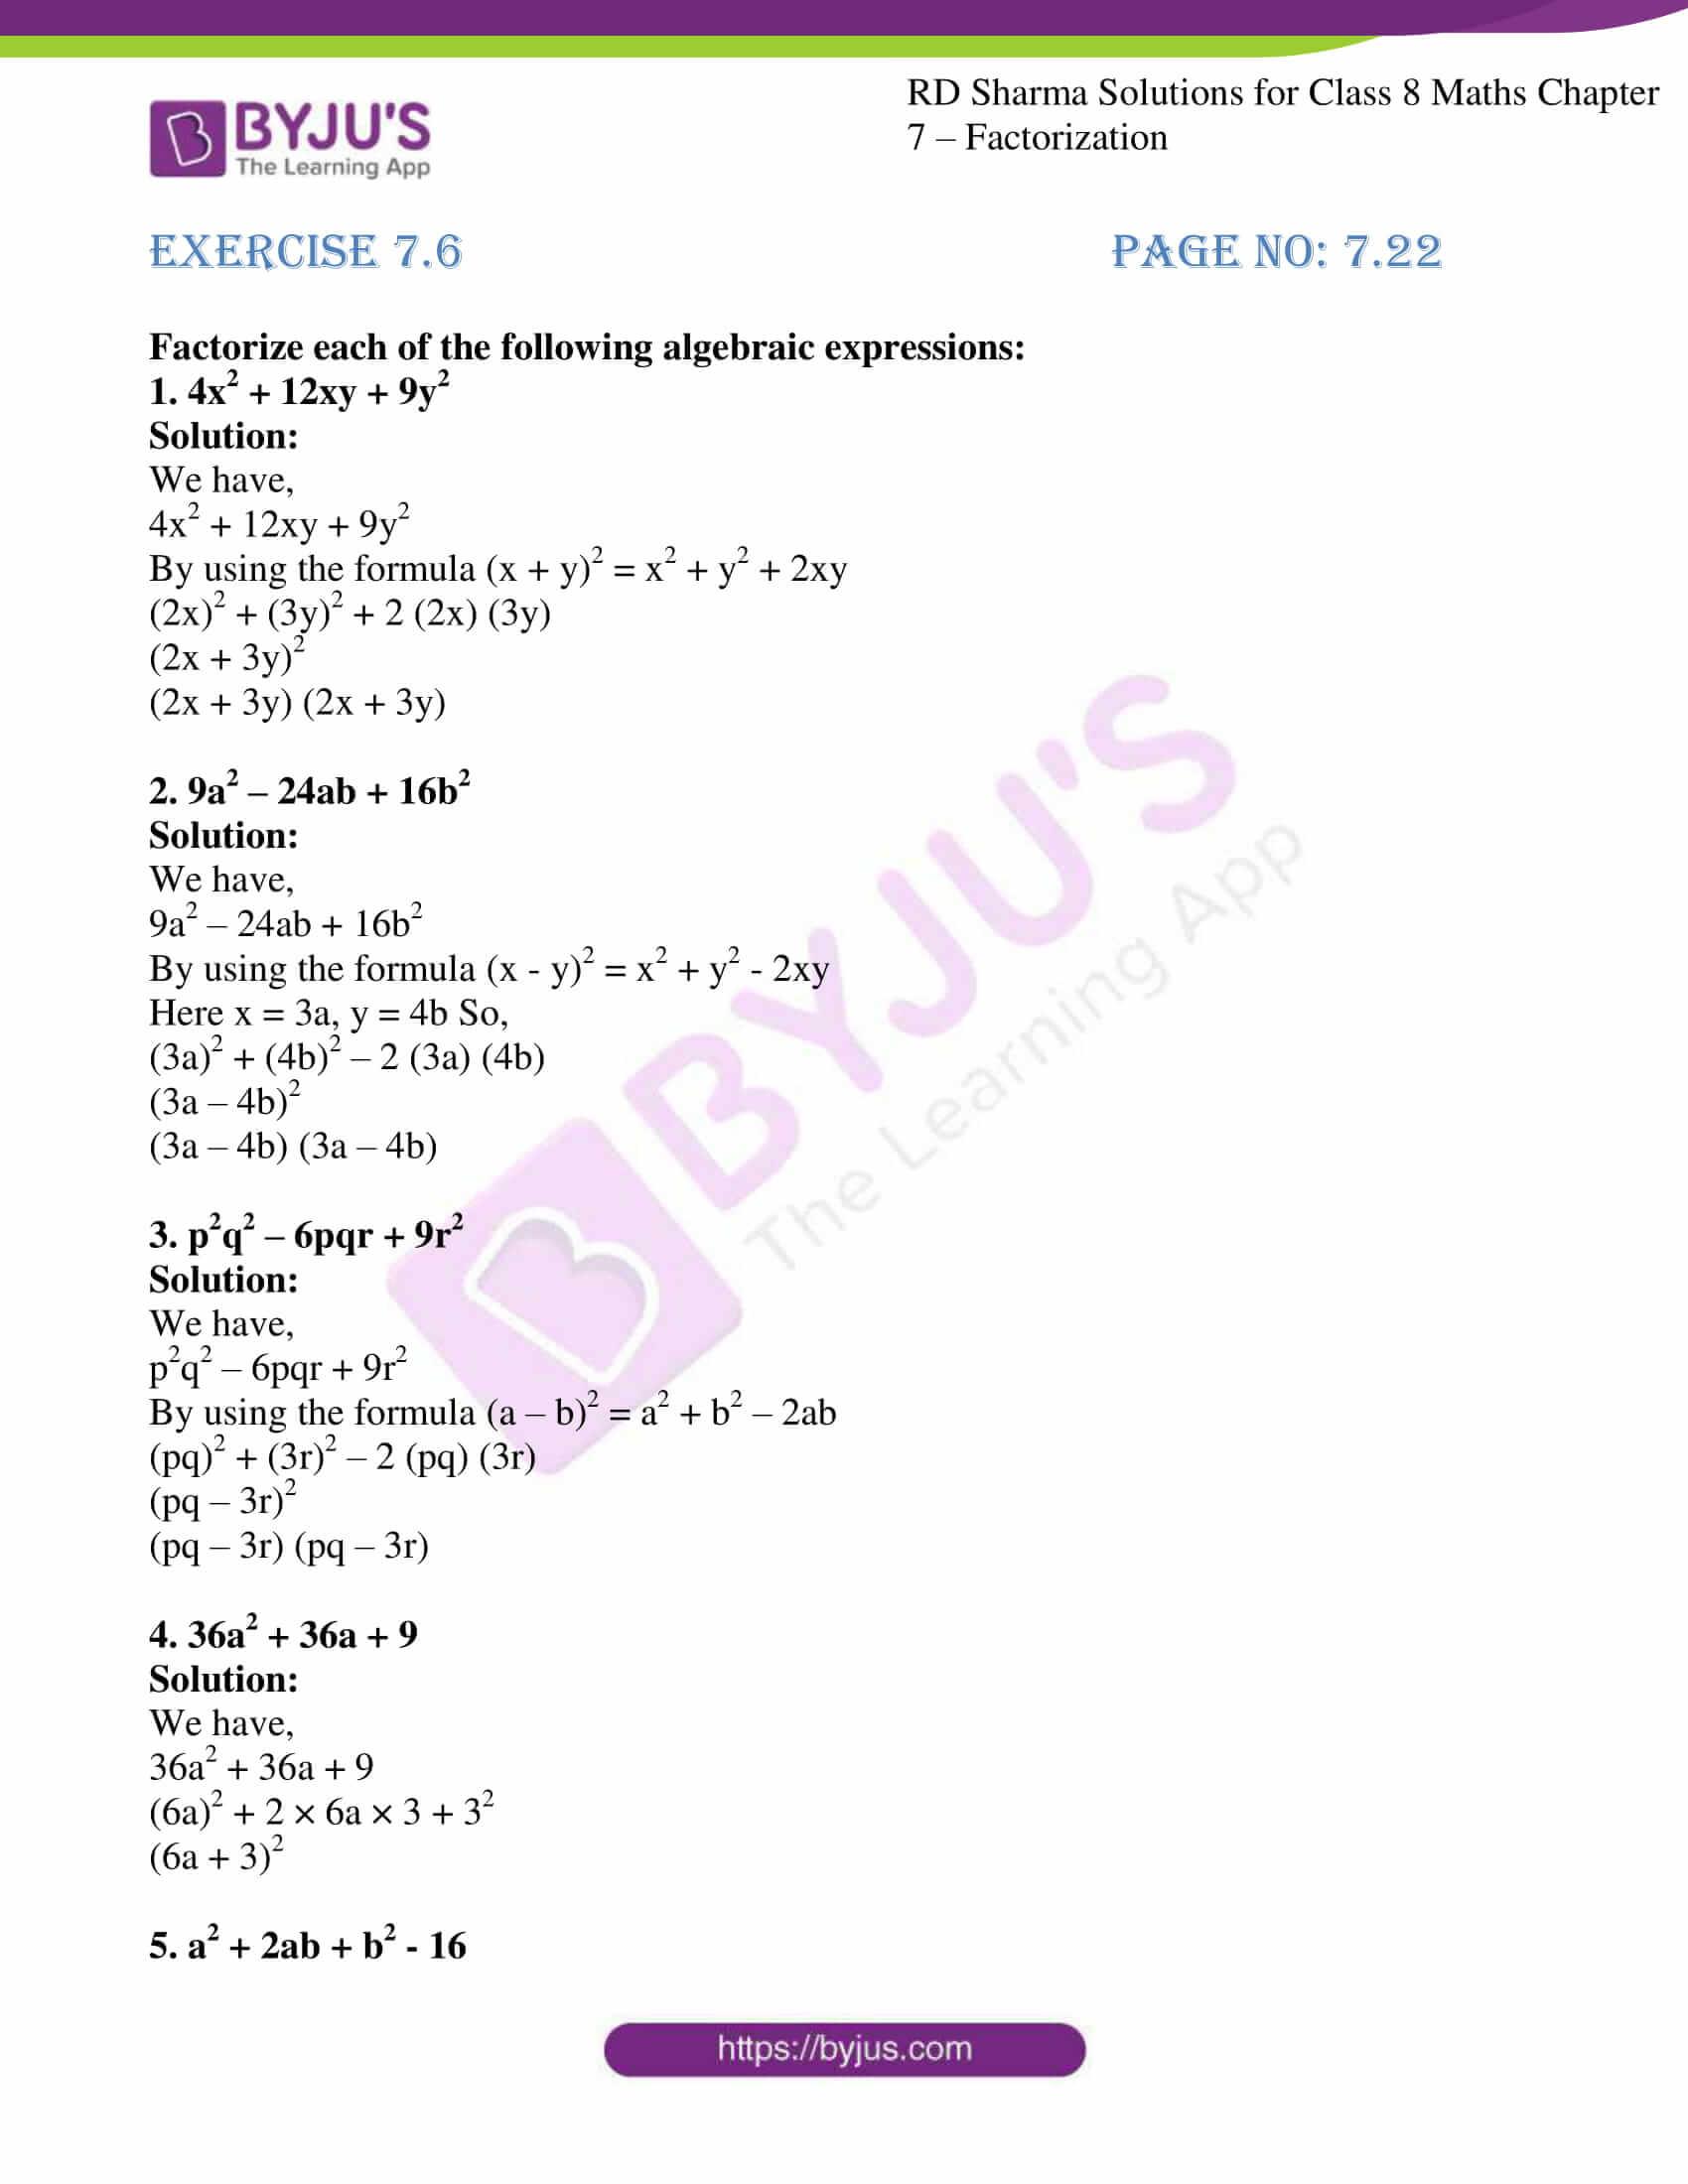 rd sharma class 8 maths chapter 7 exercise 6 1